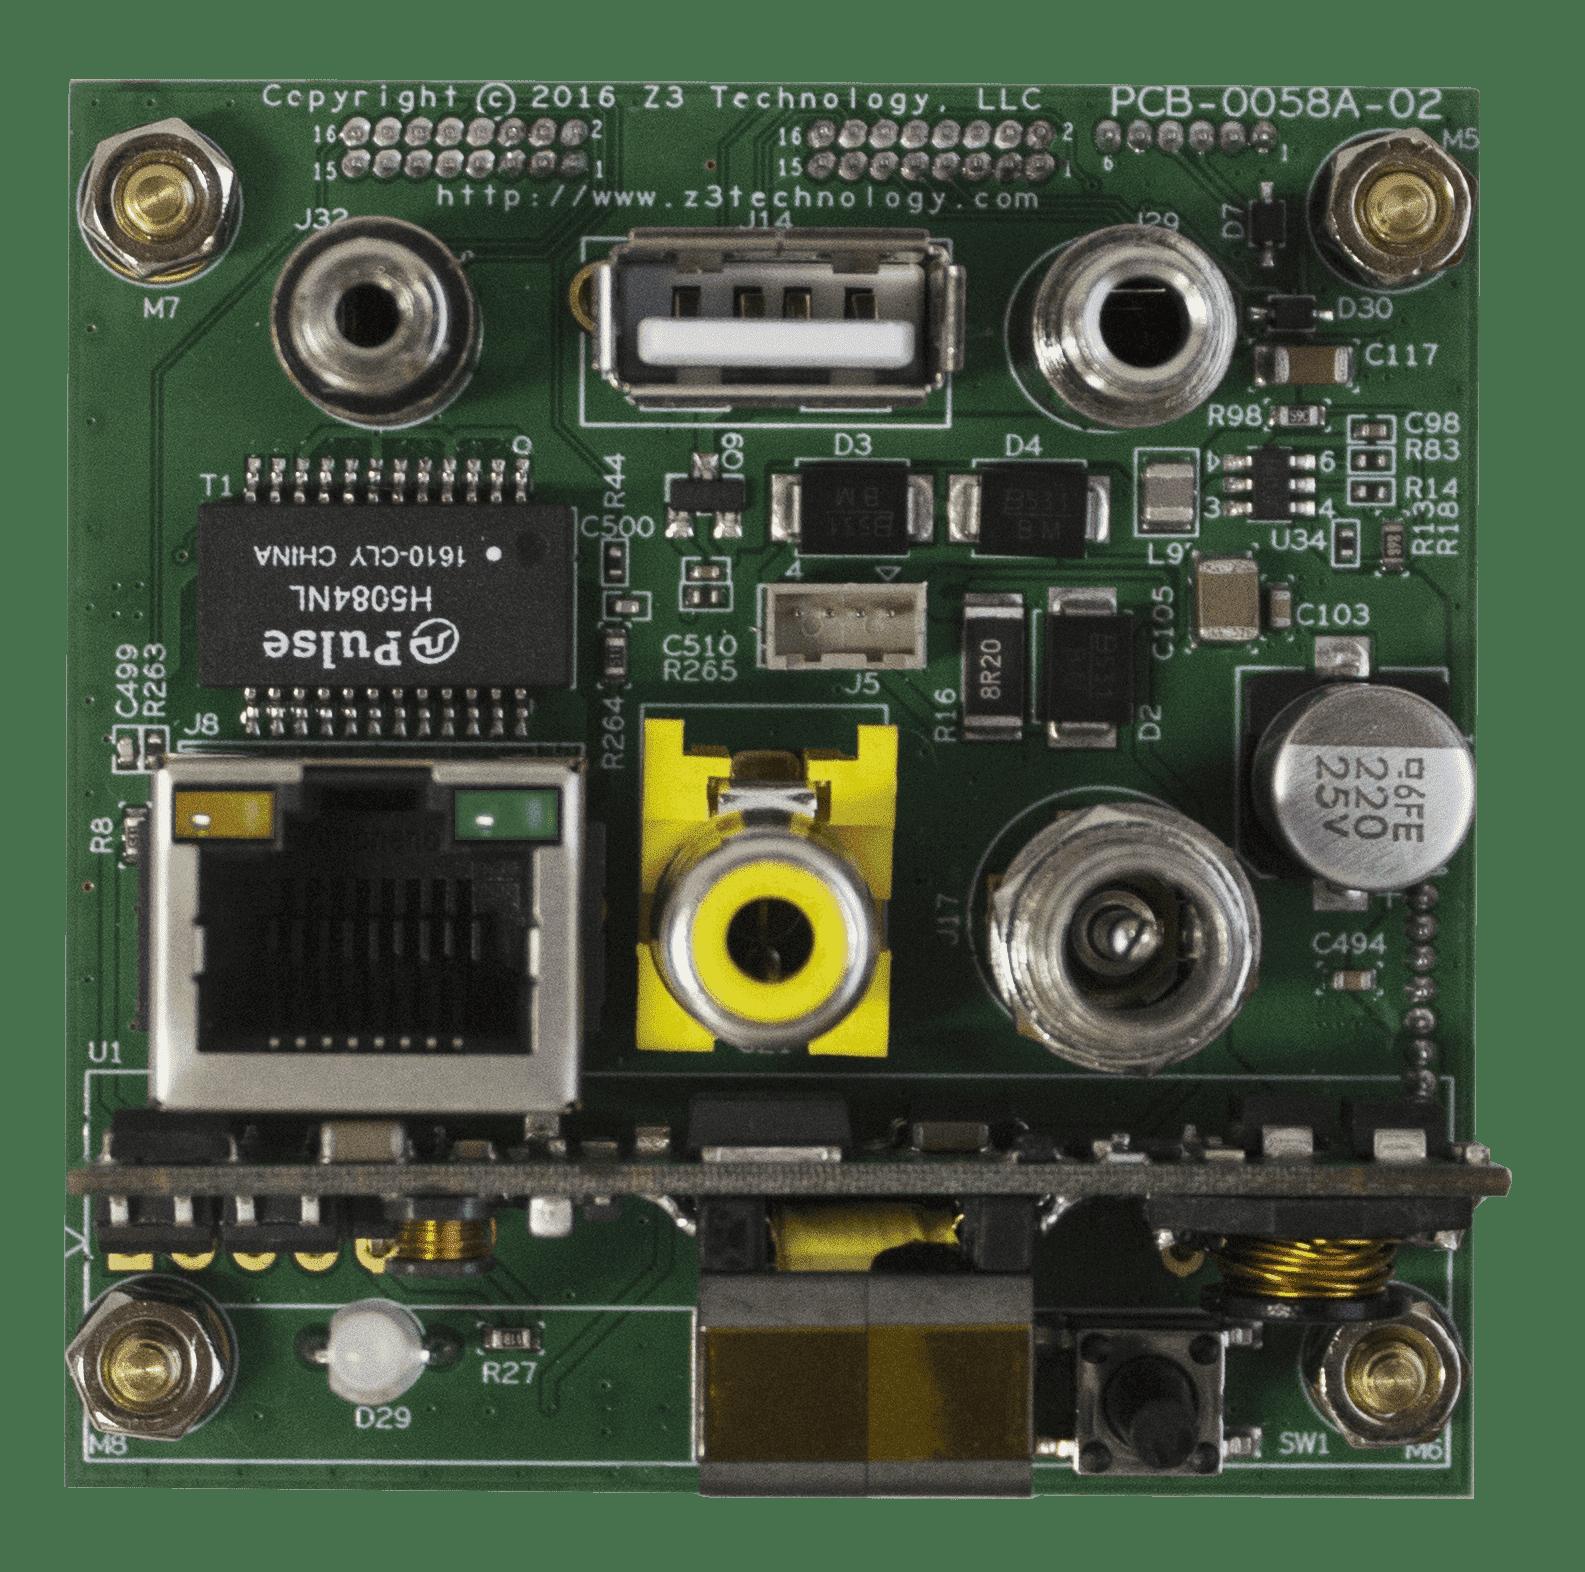 HE4K-DCK-10 Compact 4K Encoder